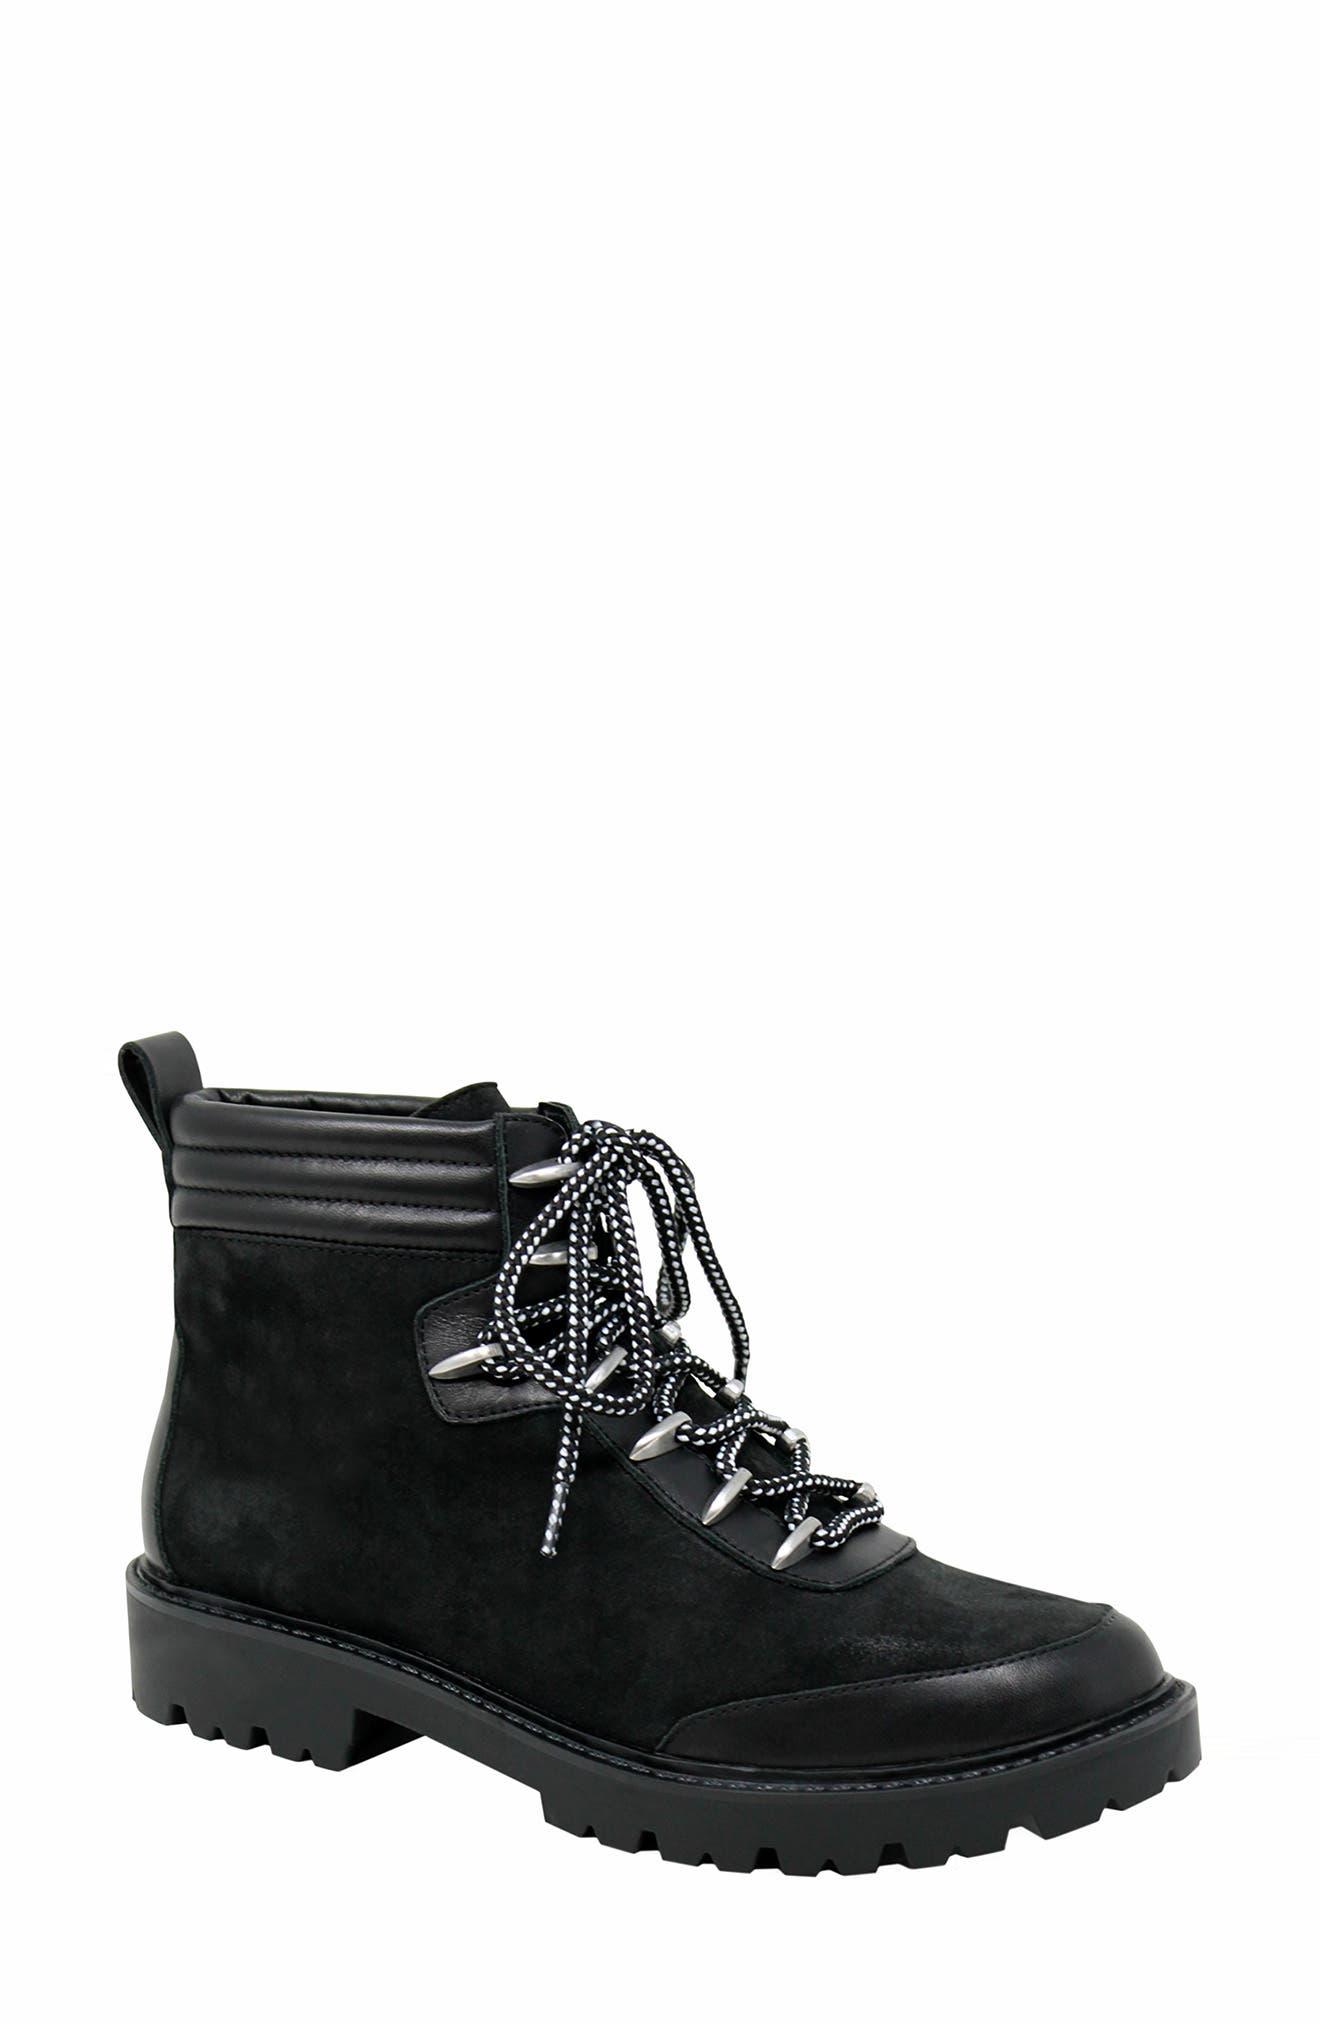 Revolve Hiker Boot